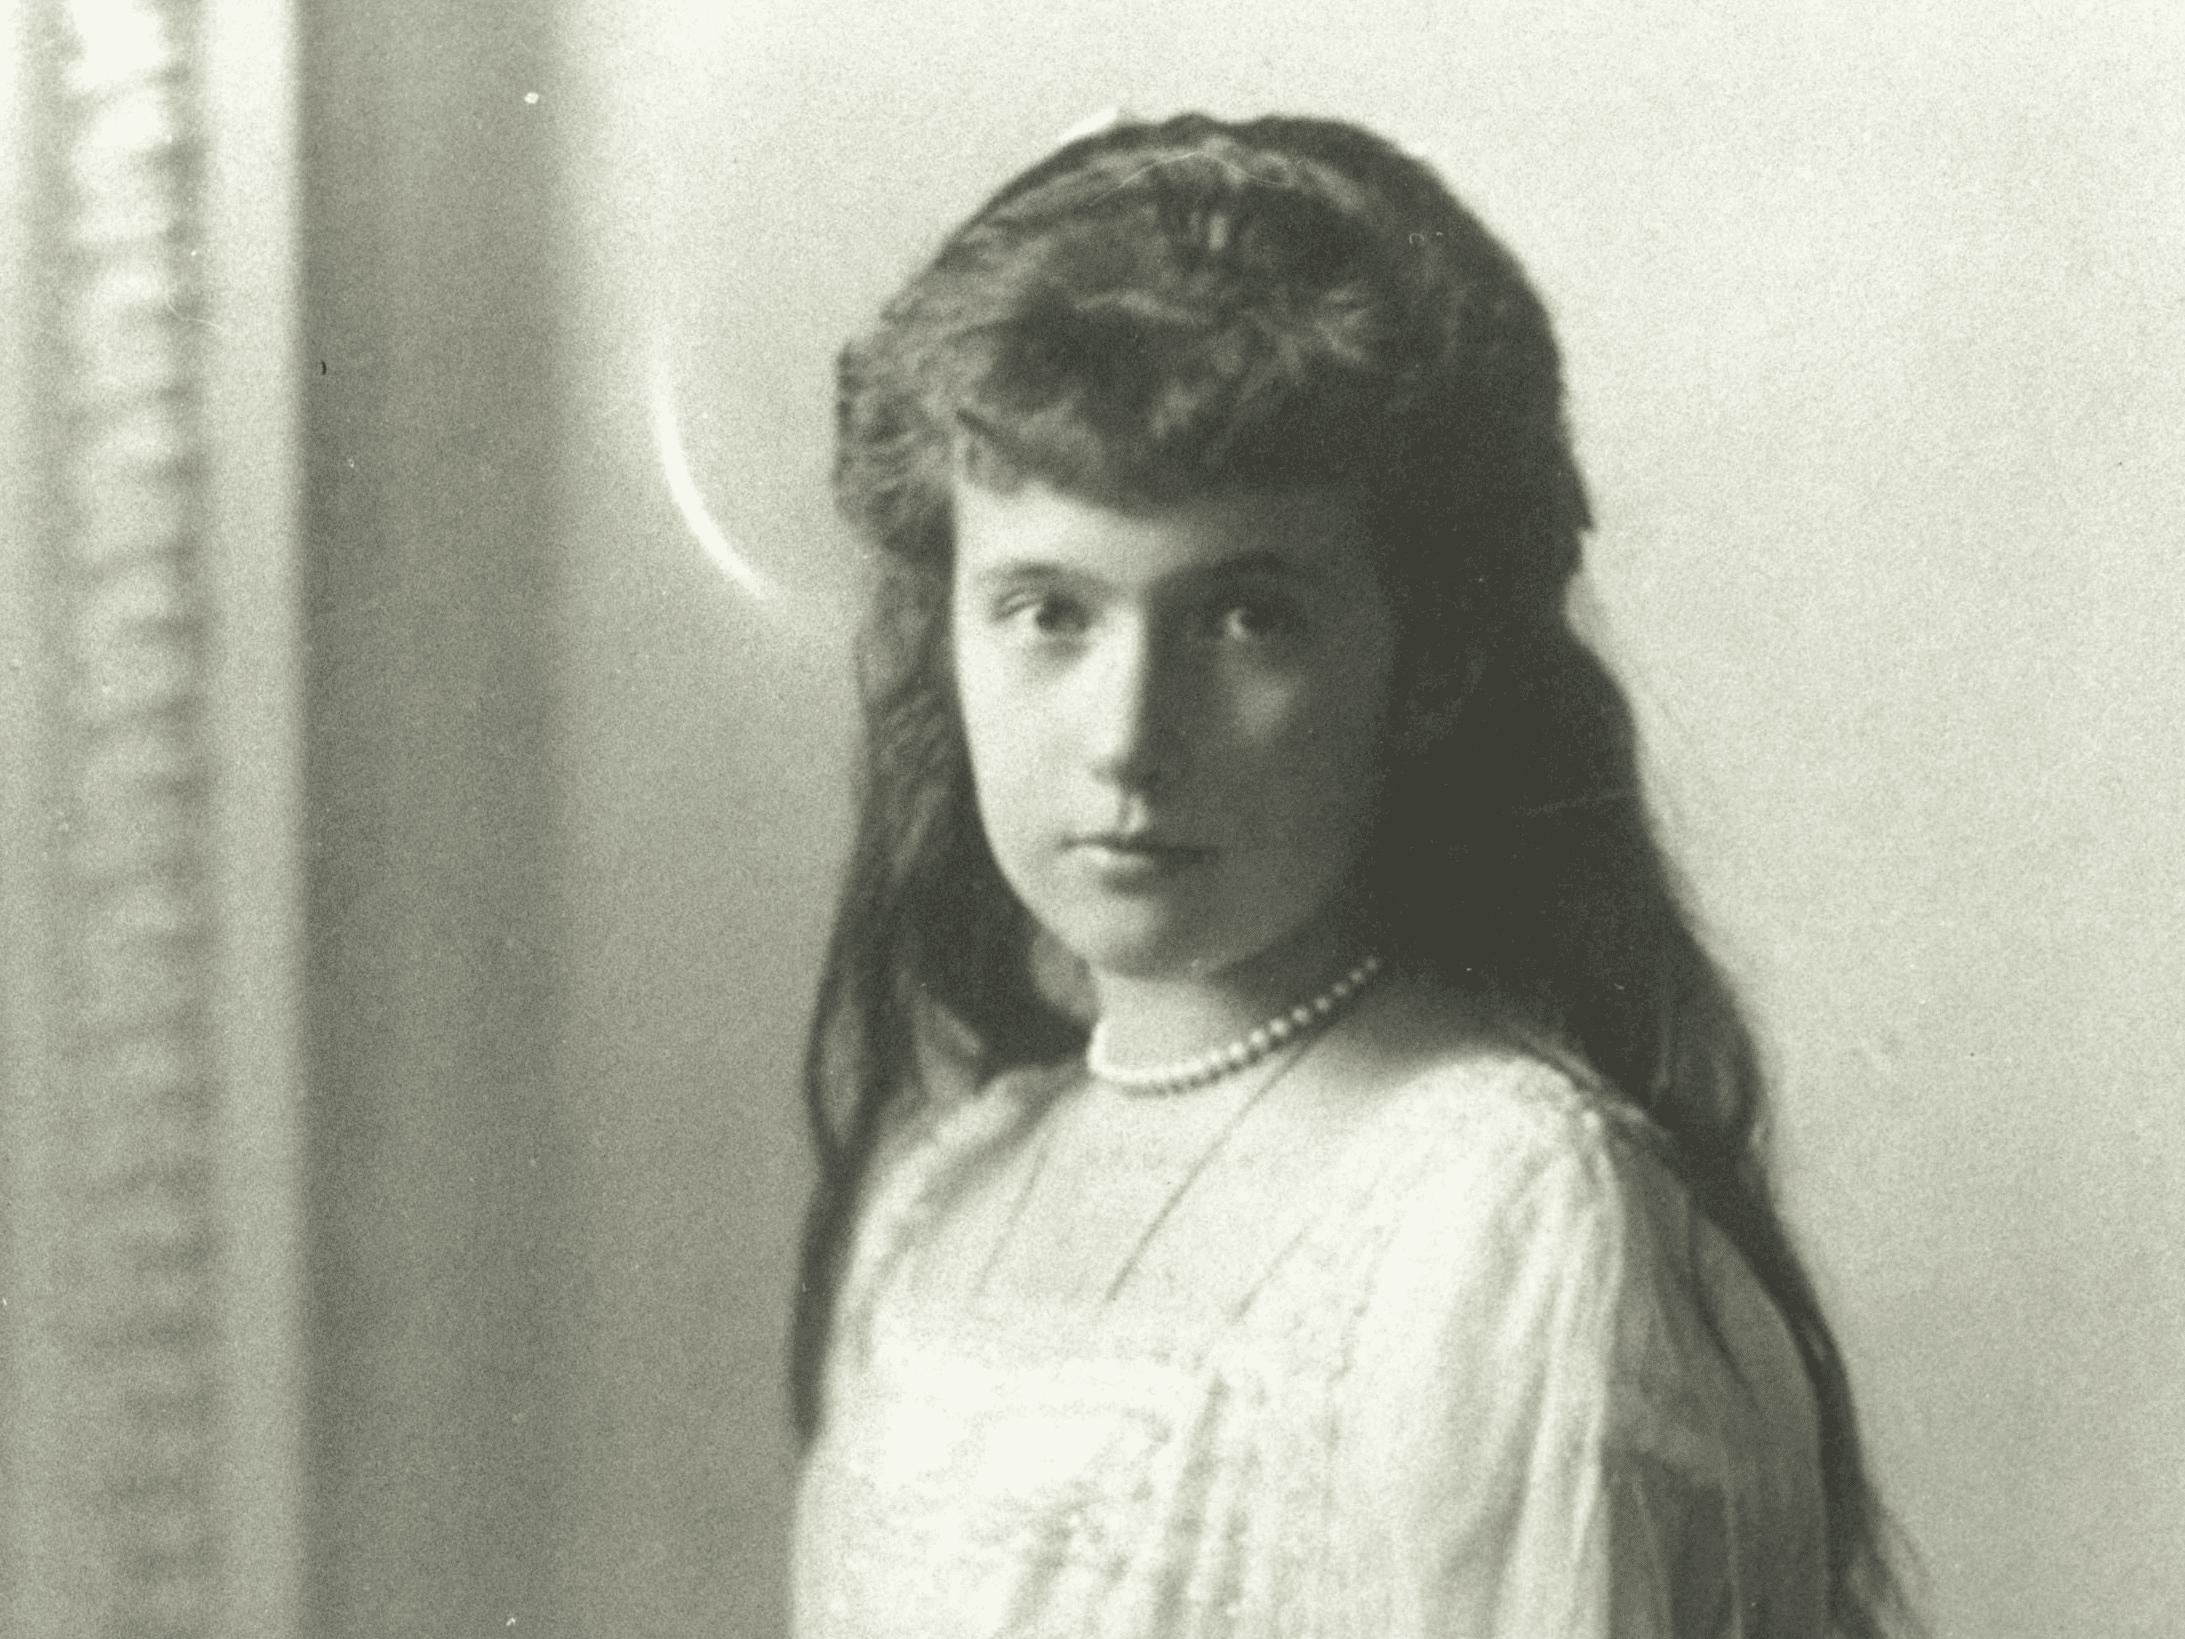 Ana Stasia & Co anastasia romanov: the mystery of her life and death